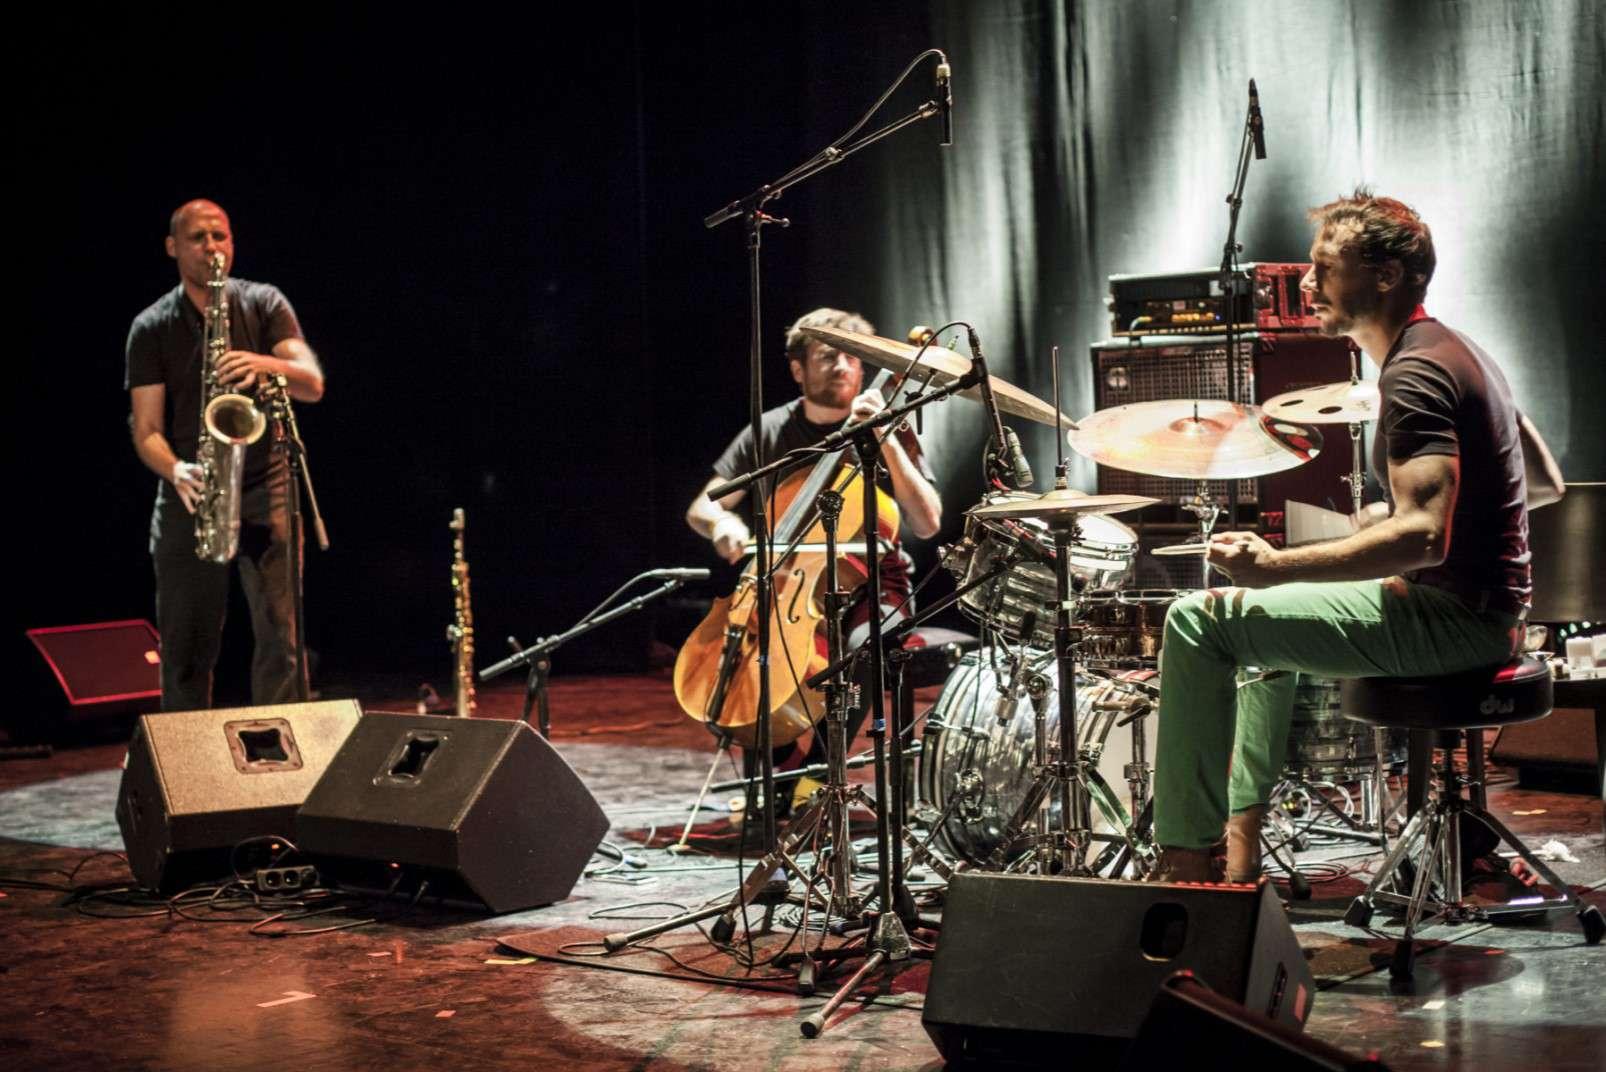 Jazzfest Berlin 2018, Hermia, Ceccaldi, Darrifourcq